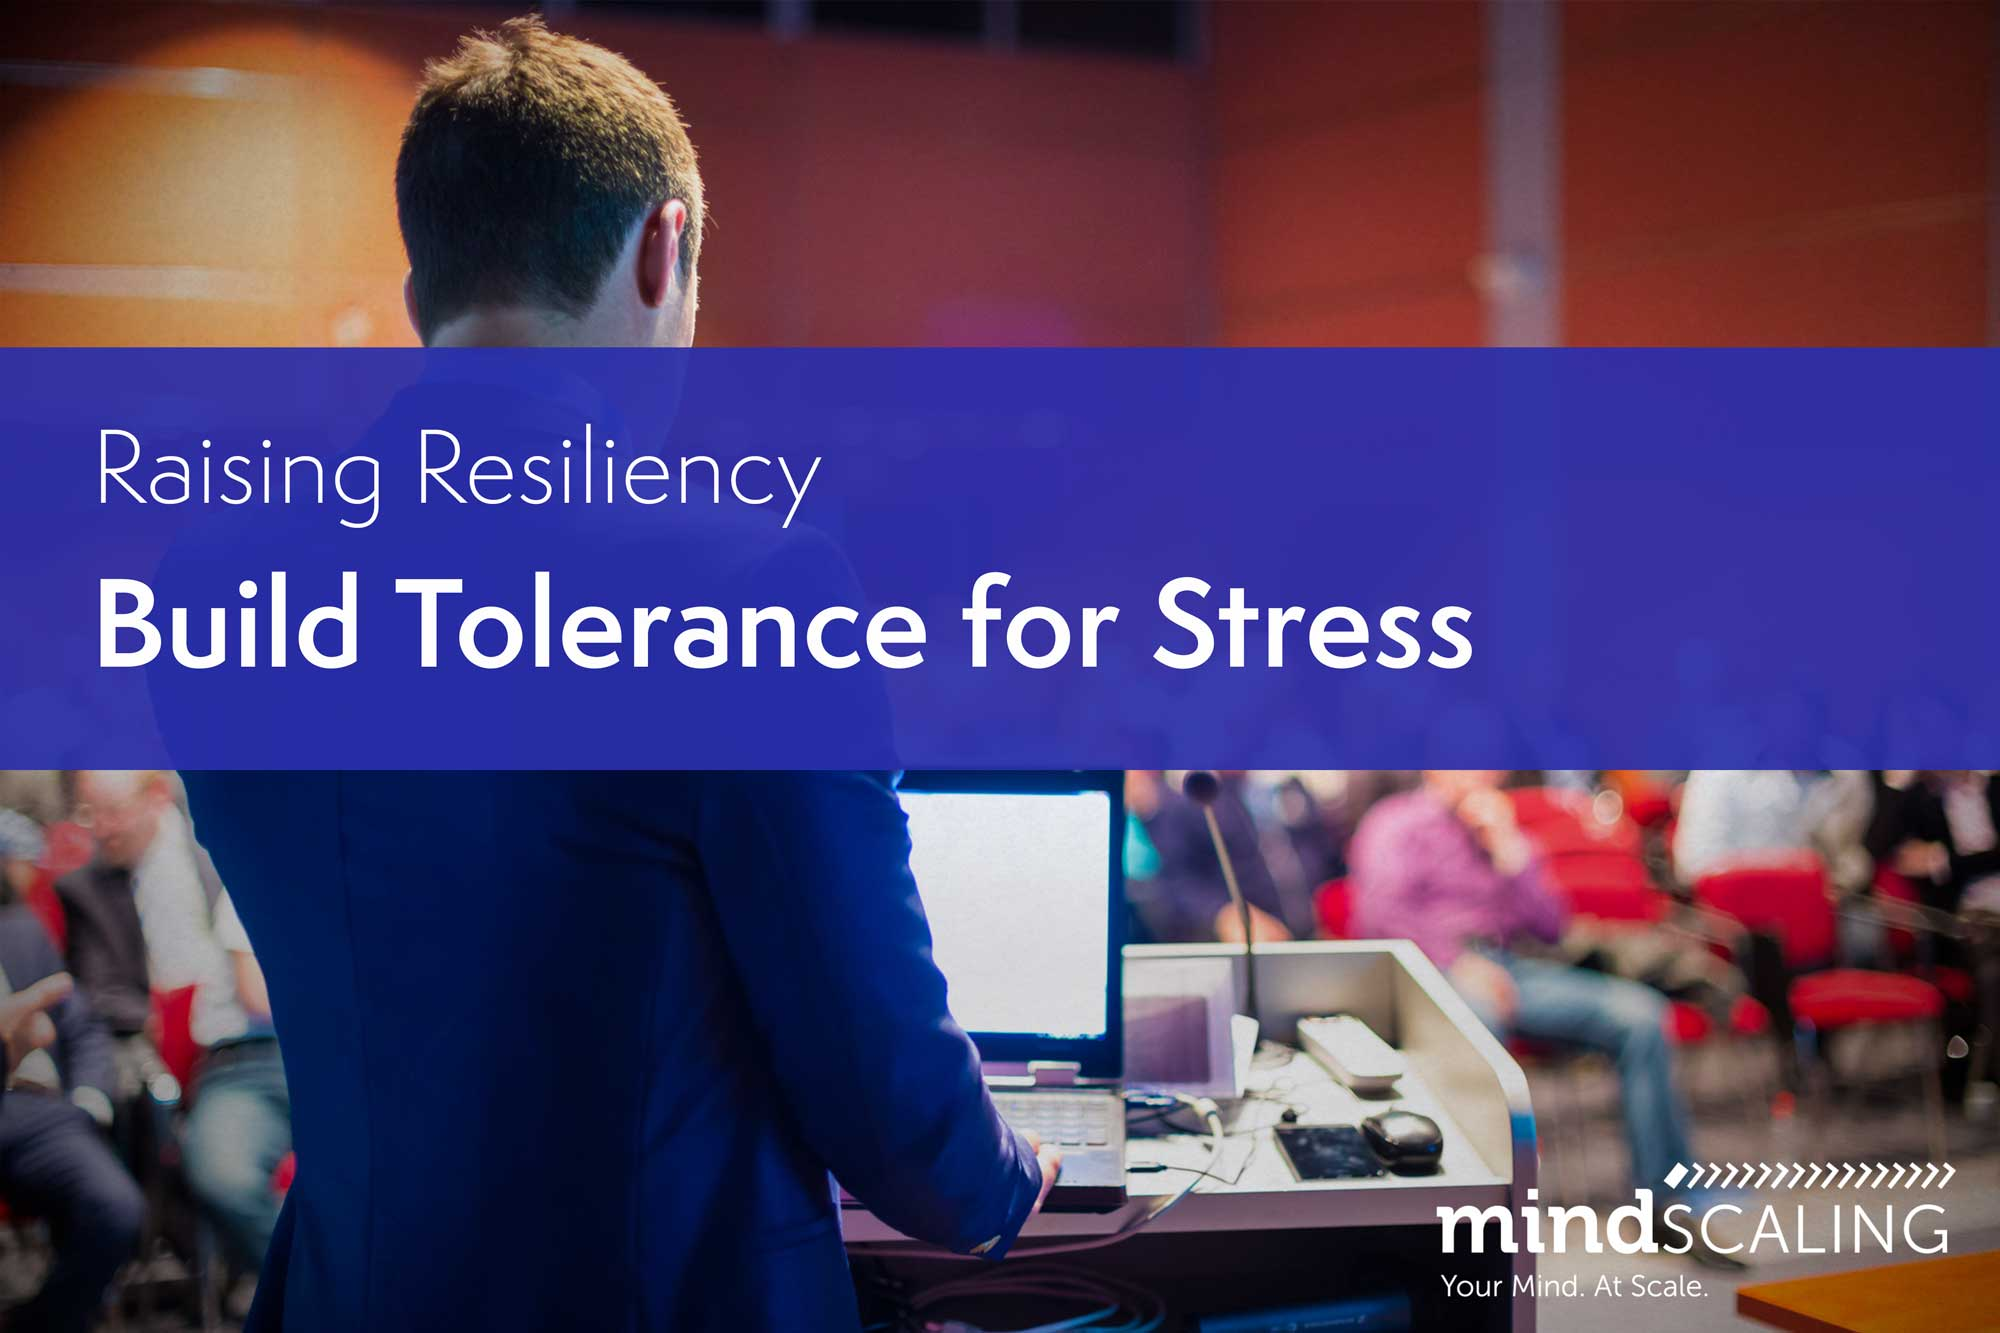 Raising Resiliency - Build Tolerance for Stress